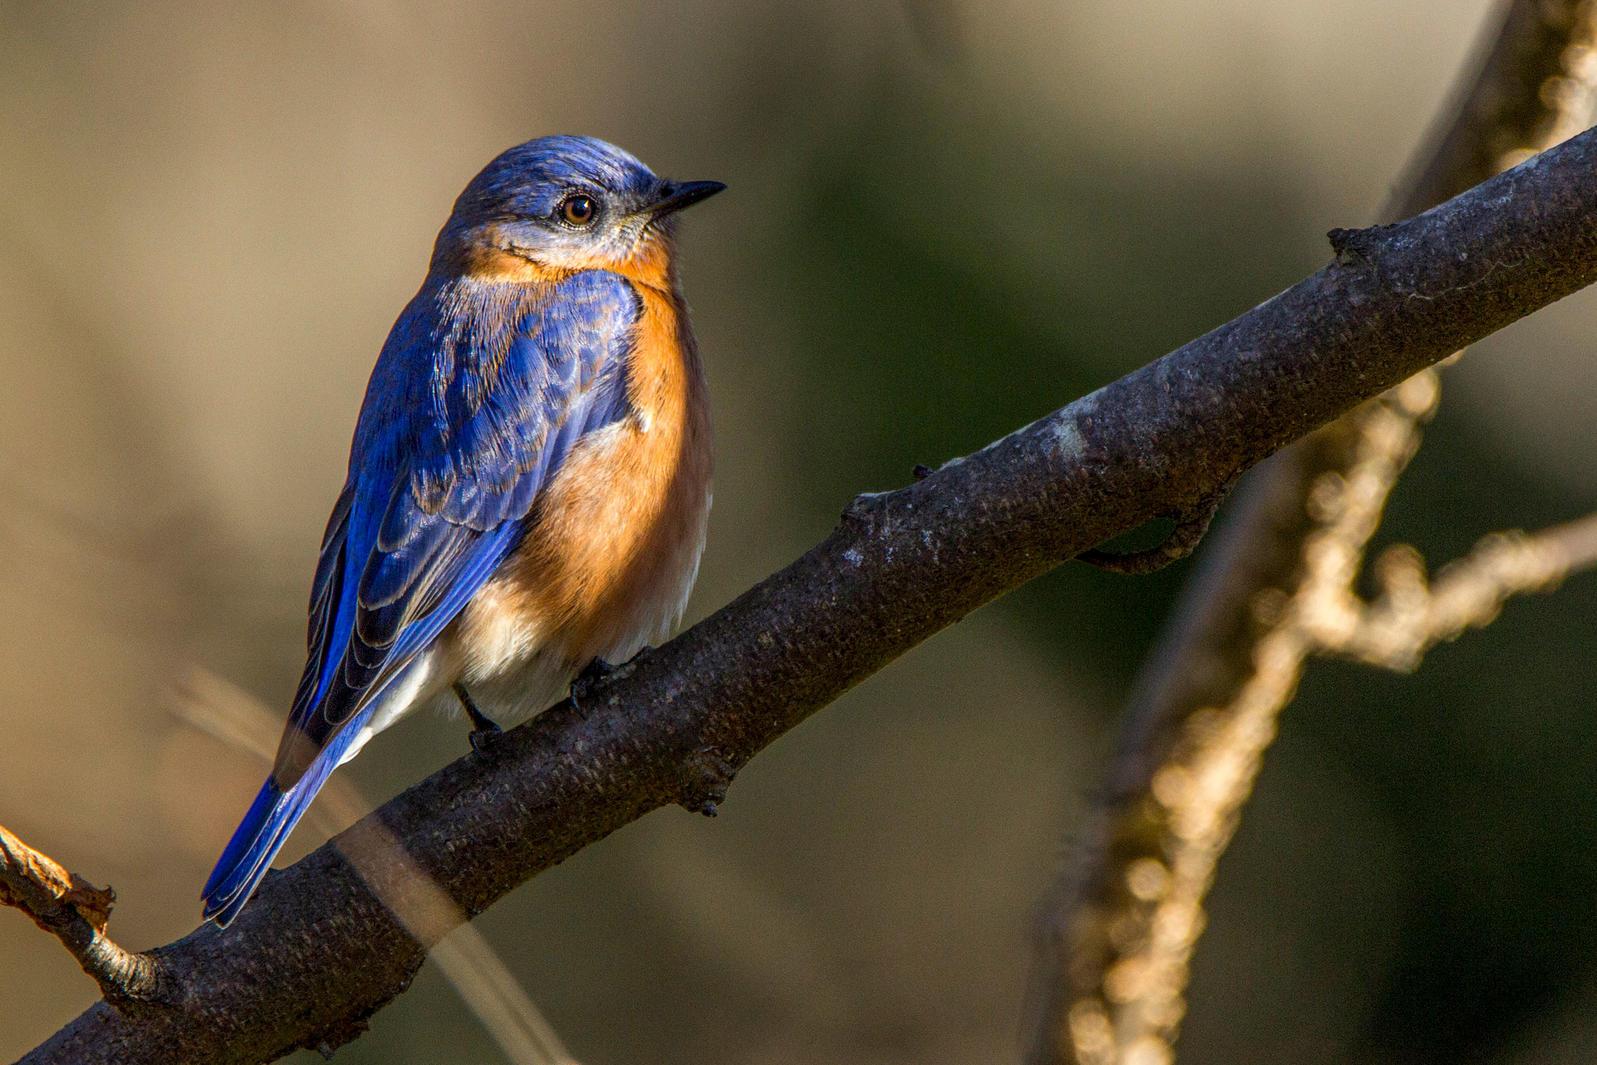 Eastern Bluebird. Kevin Lash/Audubon Photography Awards